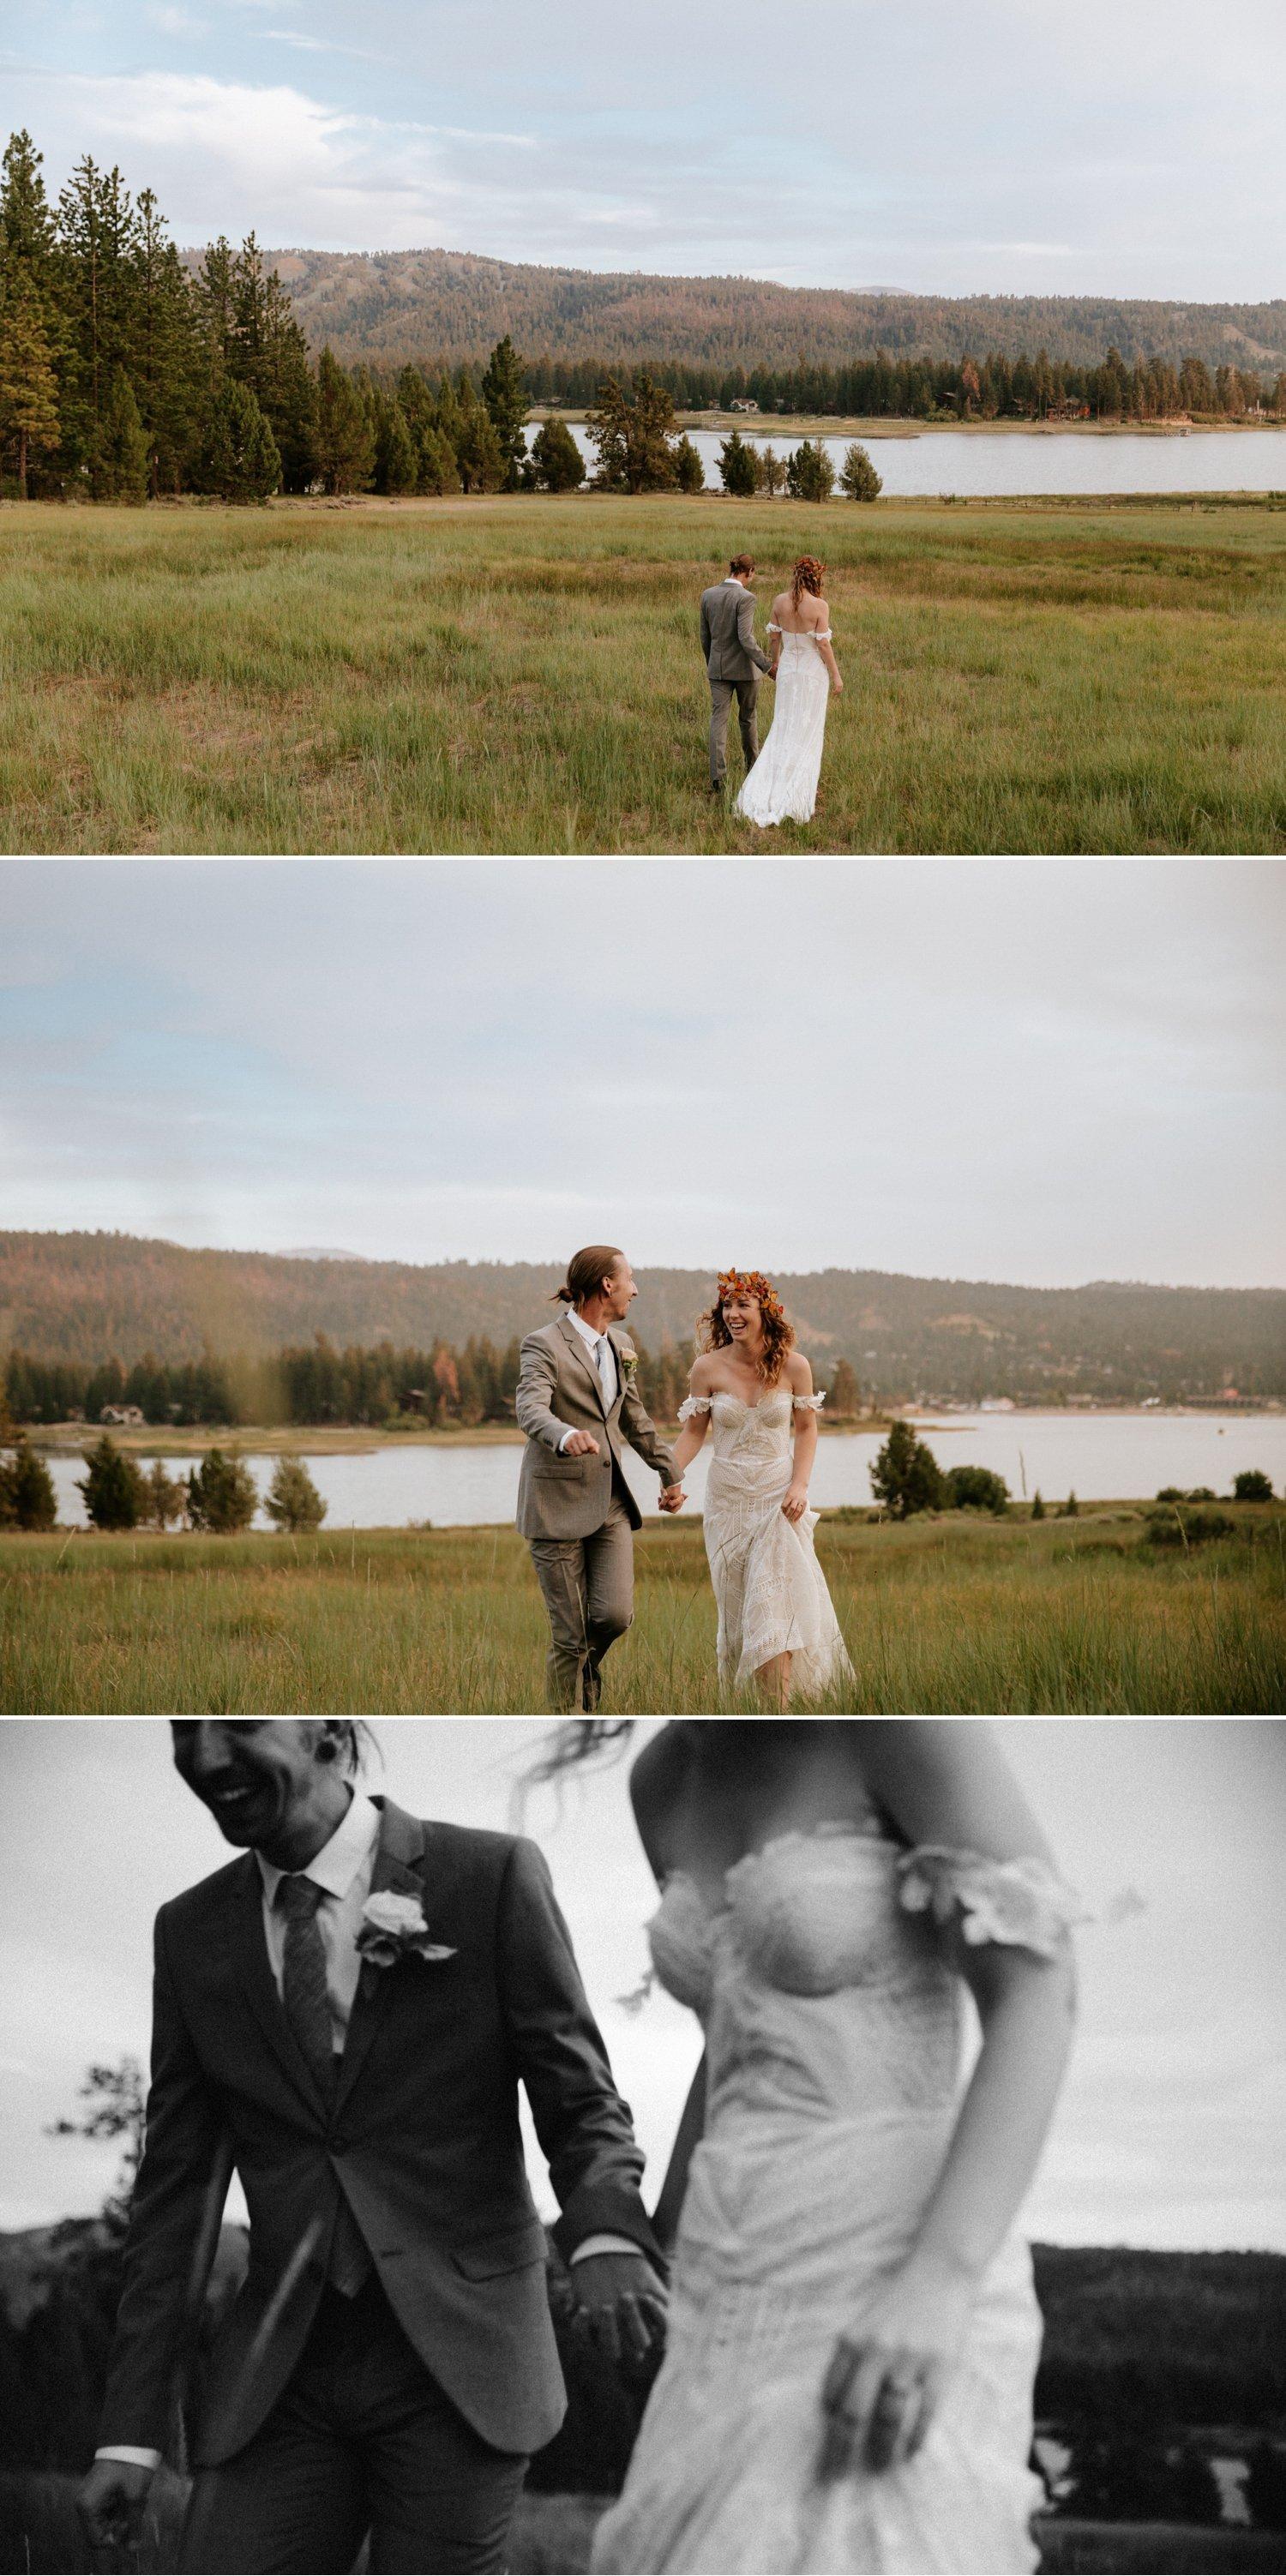 San Diego elopement photographer Paige Nelson